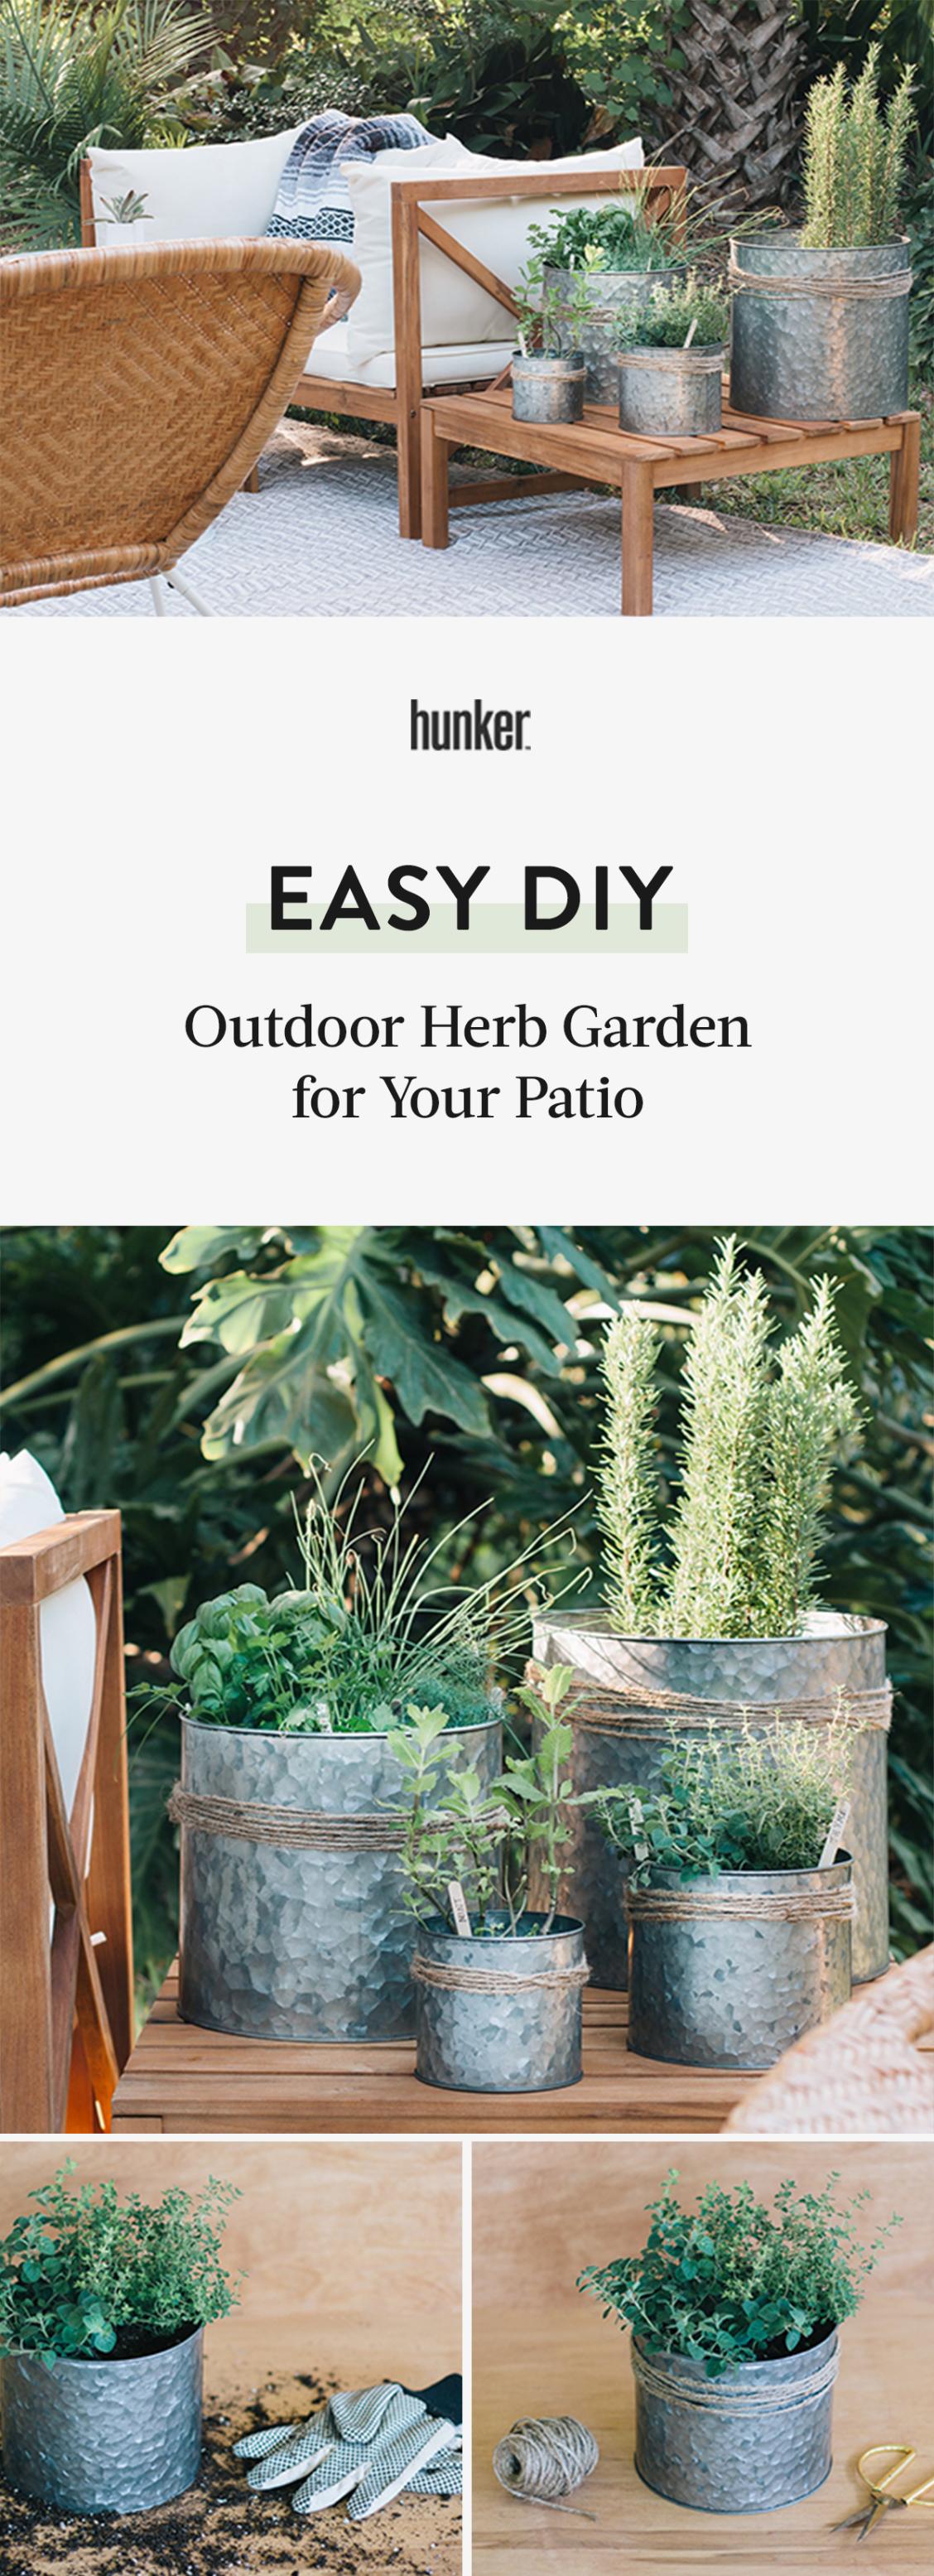 diy done outdoor herb garden for your patio outdoor herb garden herb garden herbs on outdoor kitchen herb garden id=28731